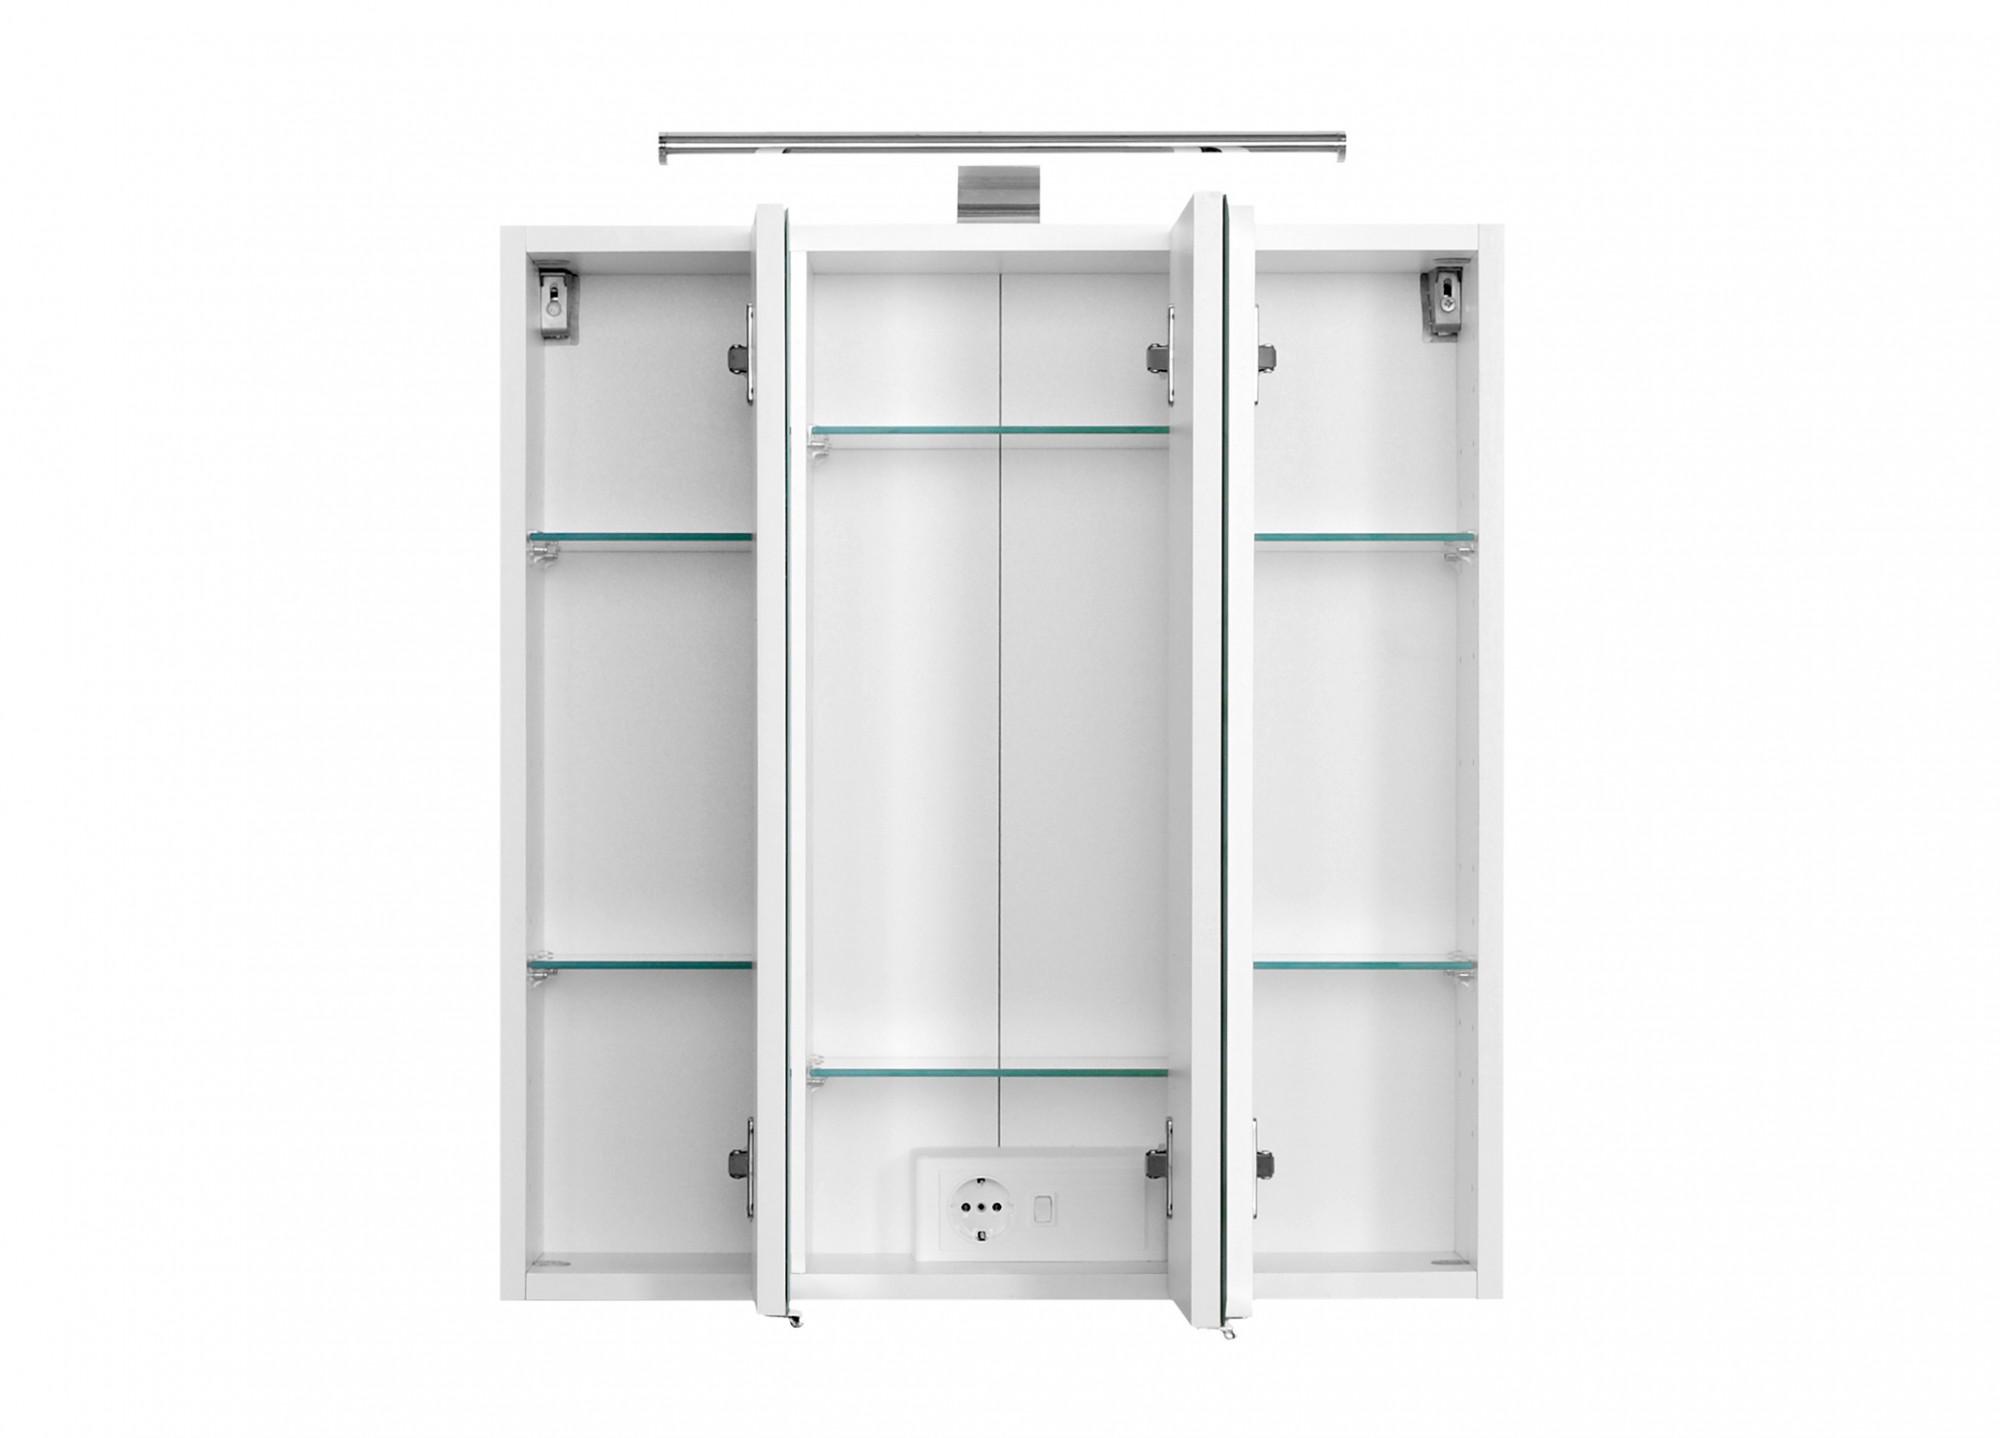 badm bel set belluno 6 teilig 140 cm breit hochglanz. Black Bedroom Furniture Sets. Home Design Ideas